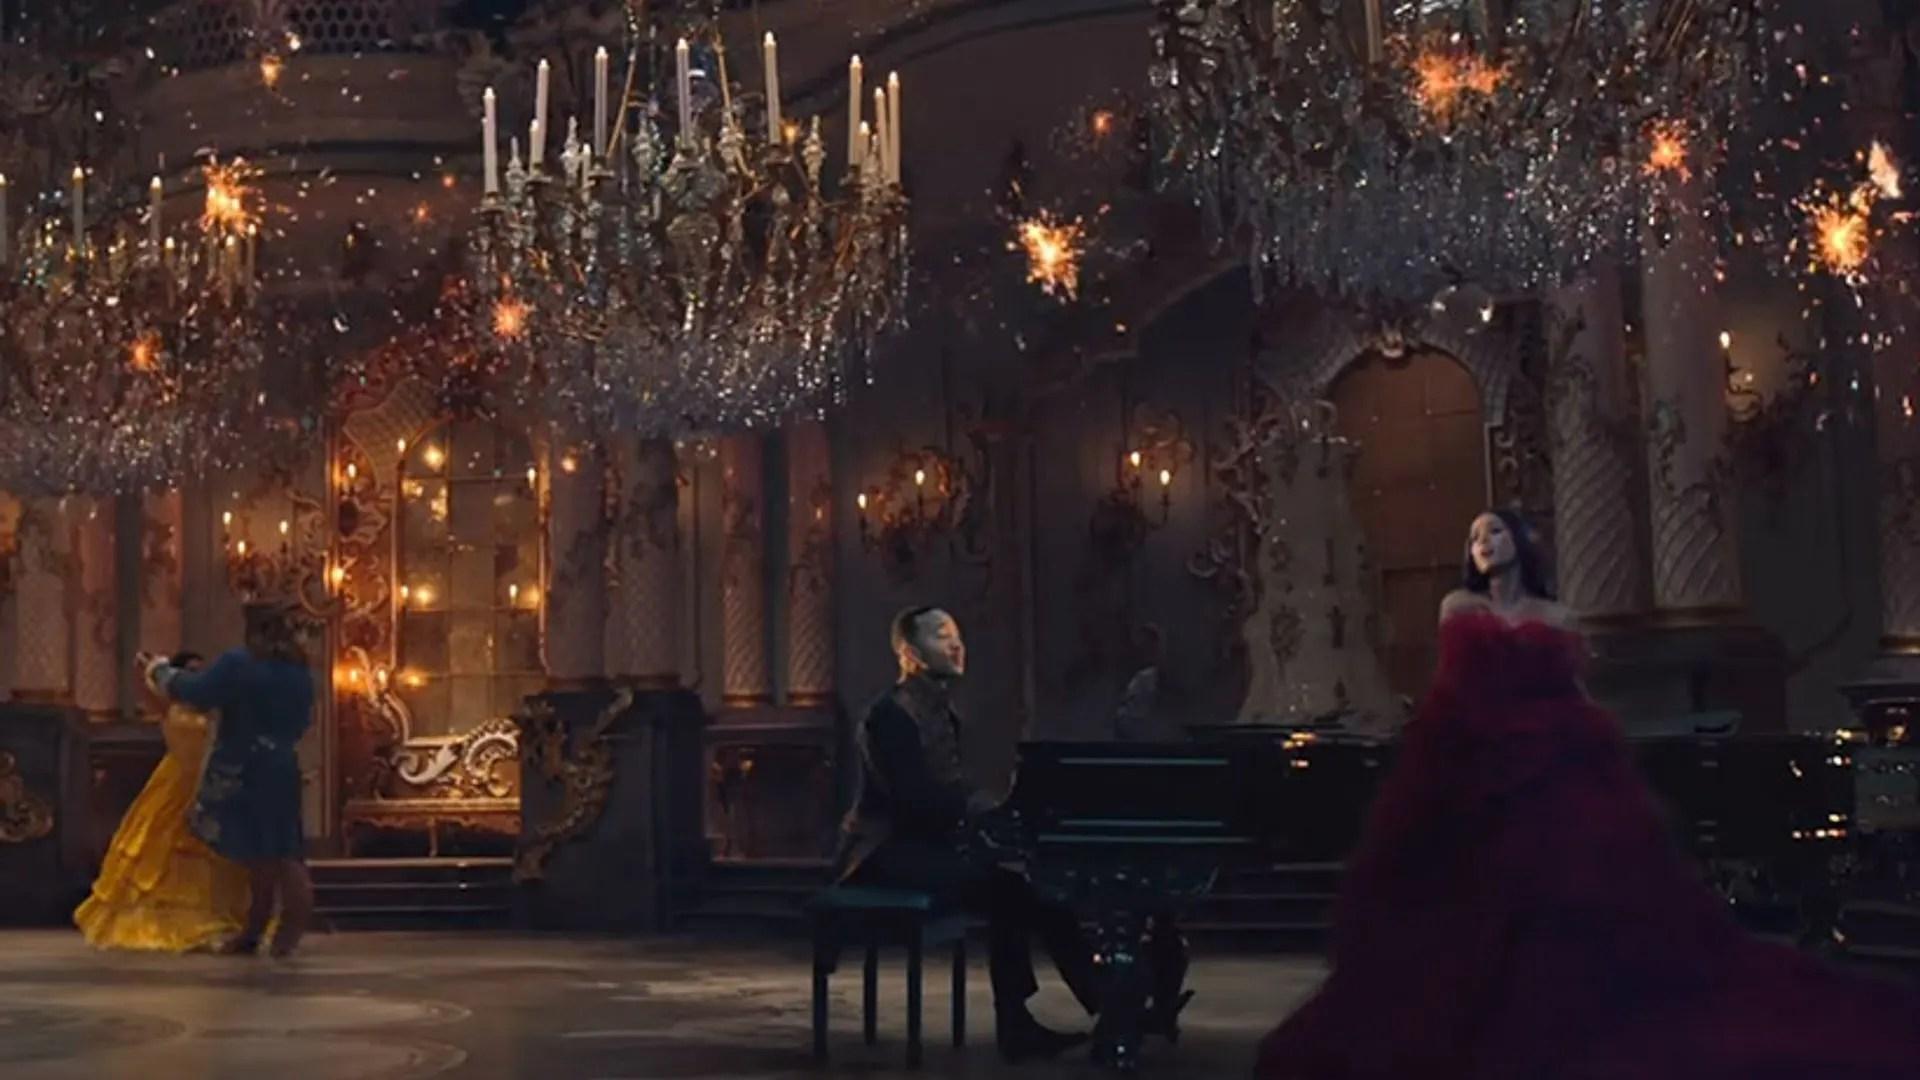 https://i1.wp.com/www.hellomagazine.com/imagenes/film/2017030637128/beauty-and-the-beast-watch-ariana-grande-and-john-legend-stunning-music-video/0-199-985/ariana-grande-t.jpg